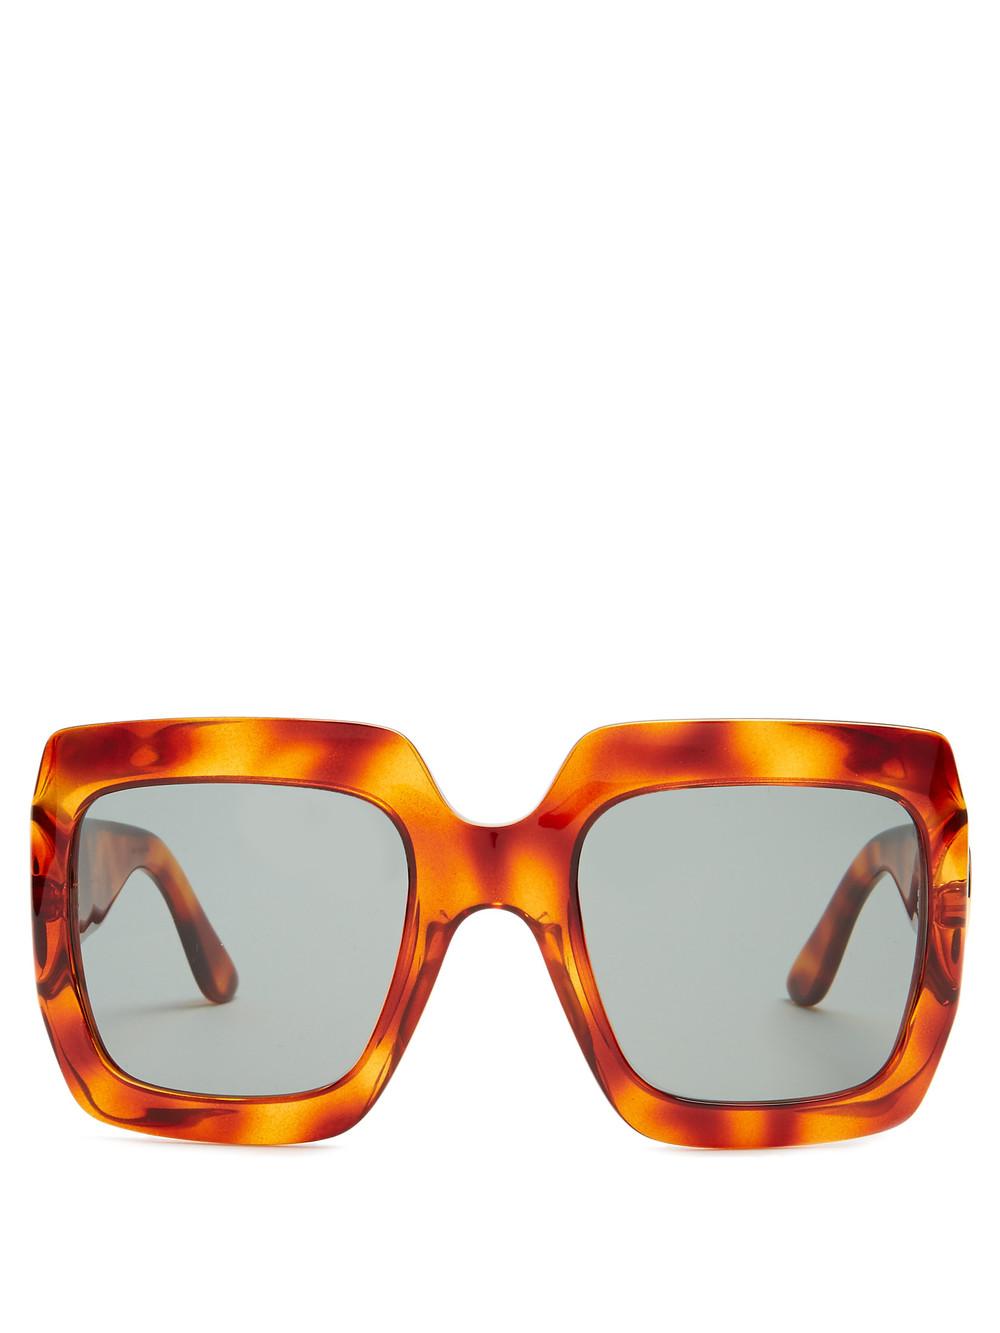 SOJOS Fashion Oversized Sunglasses for Women Square Frame